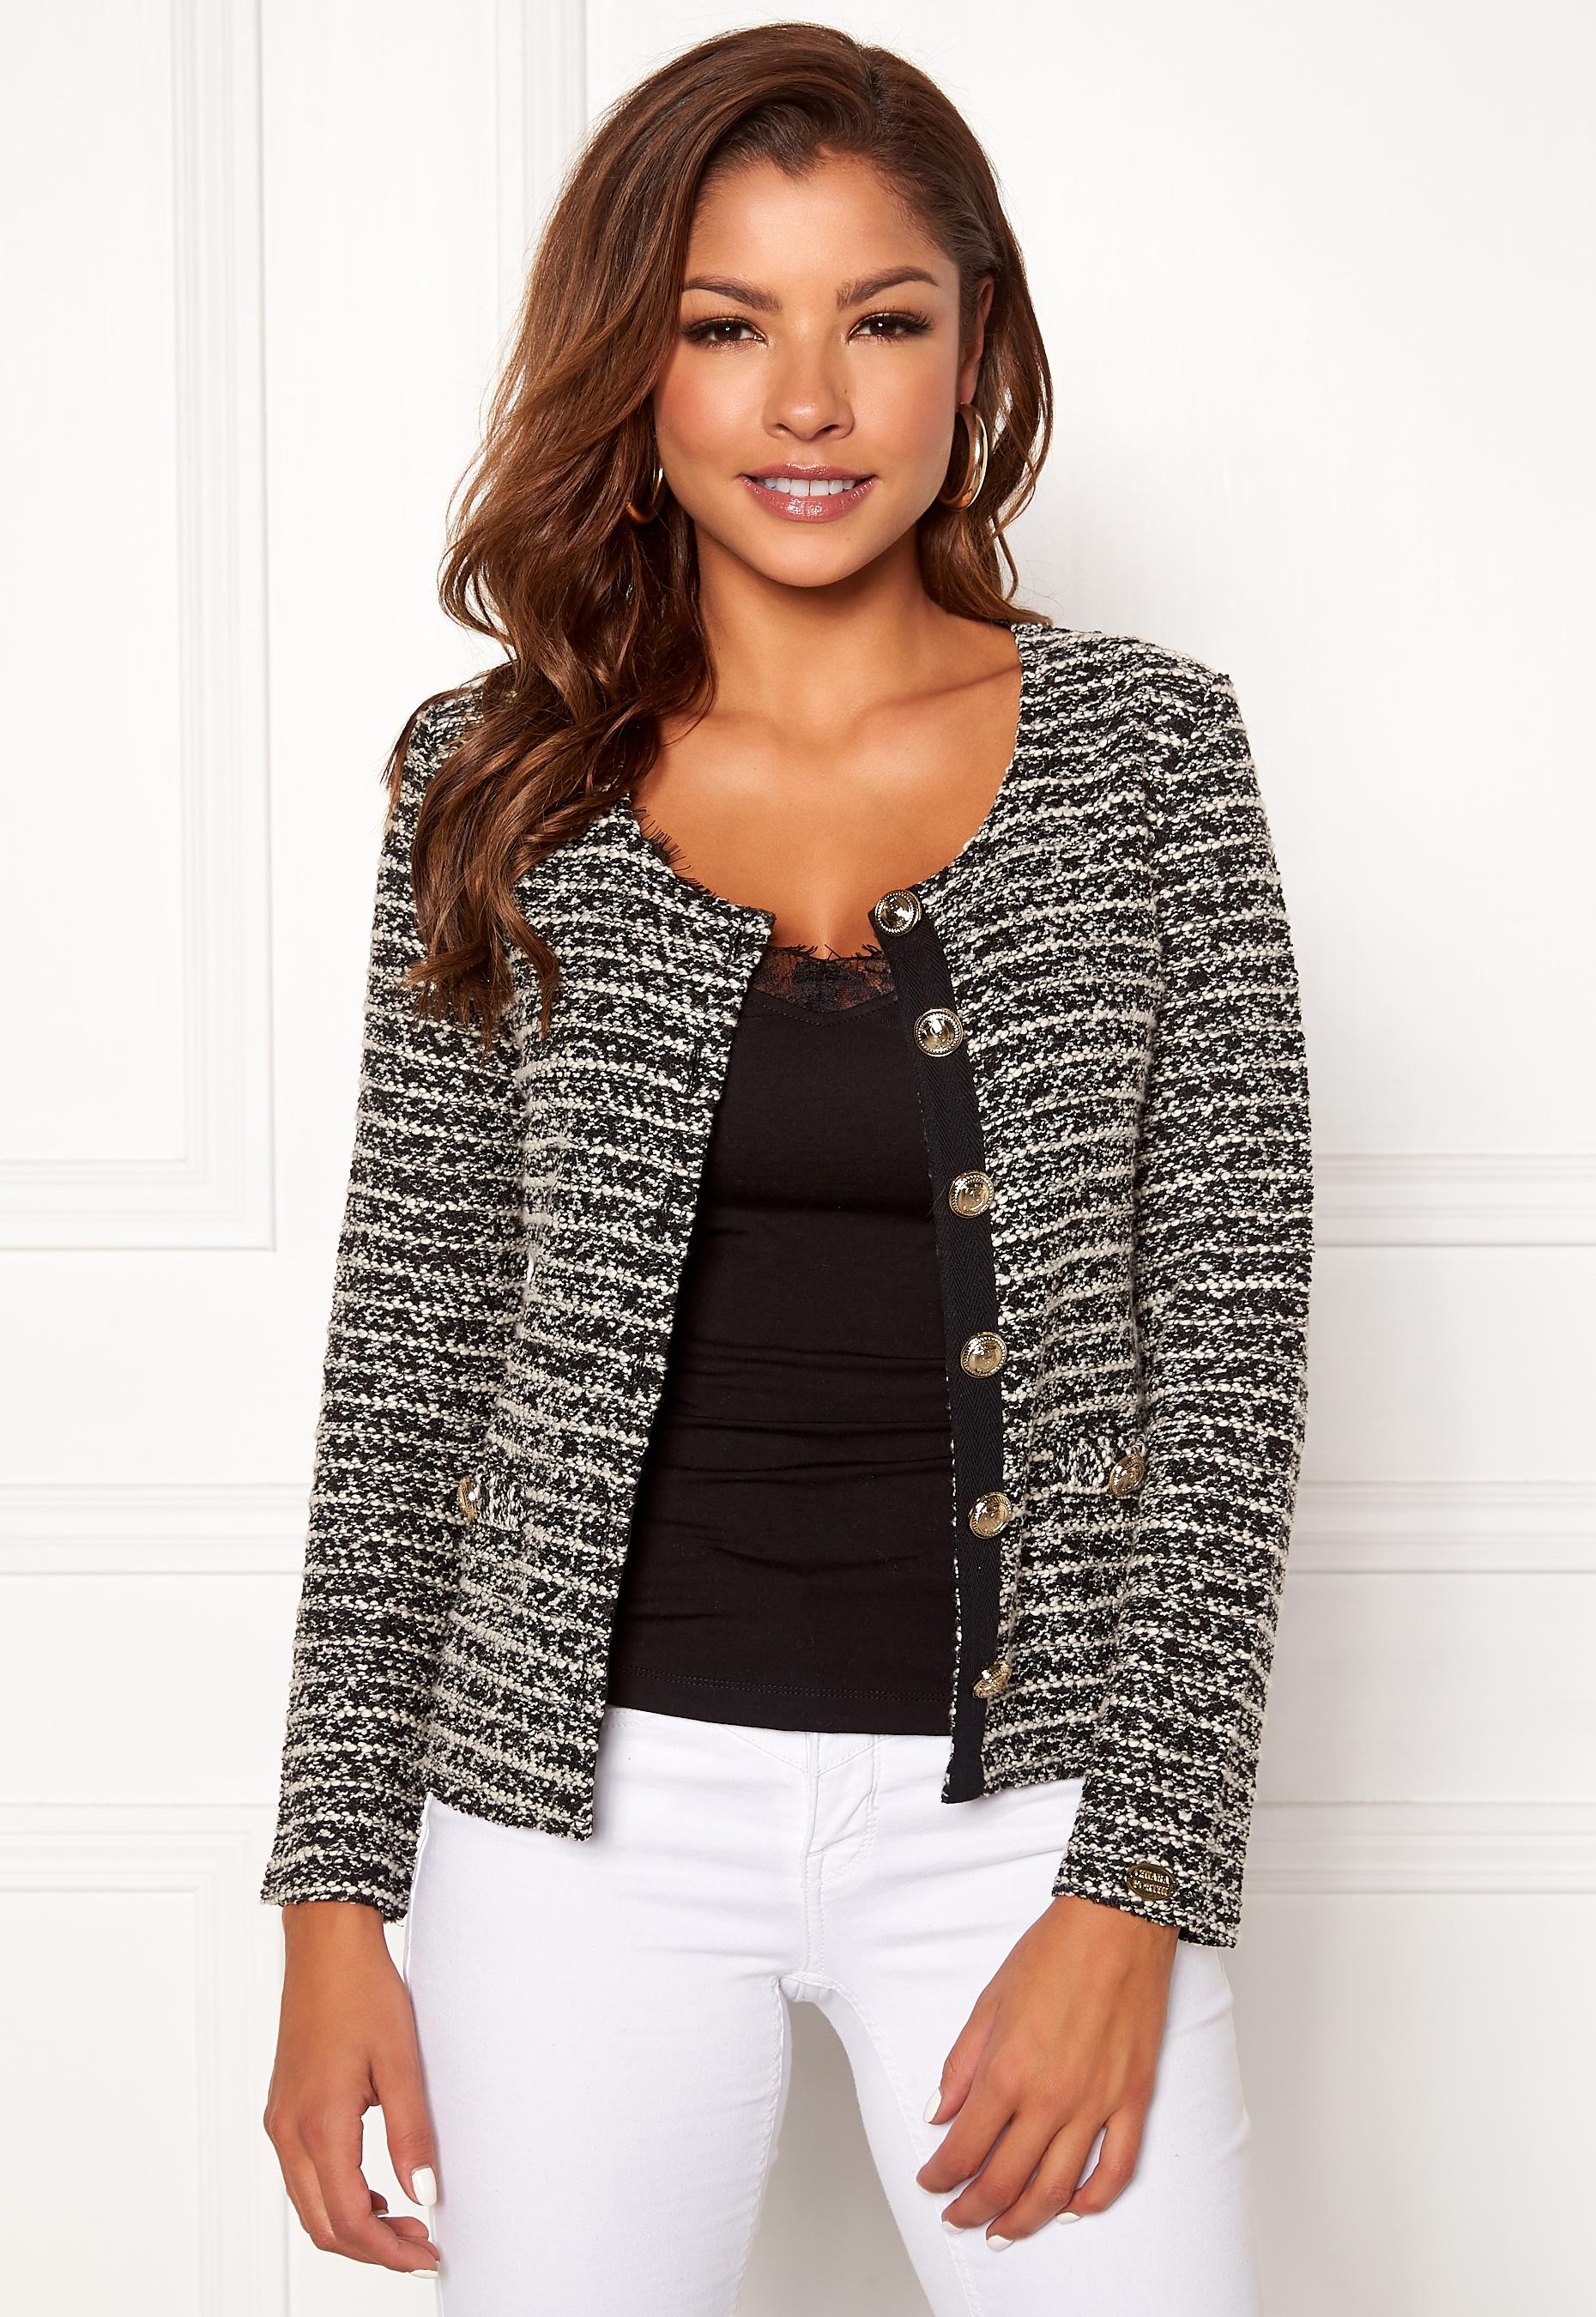 19c329b1d93f Chiara Forthi Charlize jersey jacket Black / Offwhite - Bubbleroom